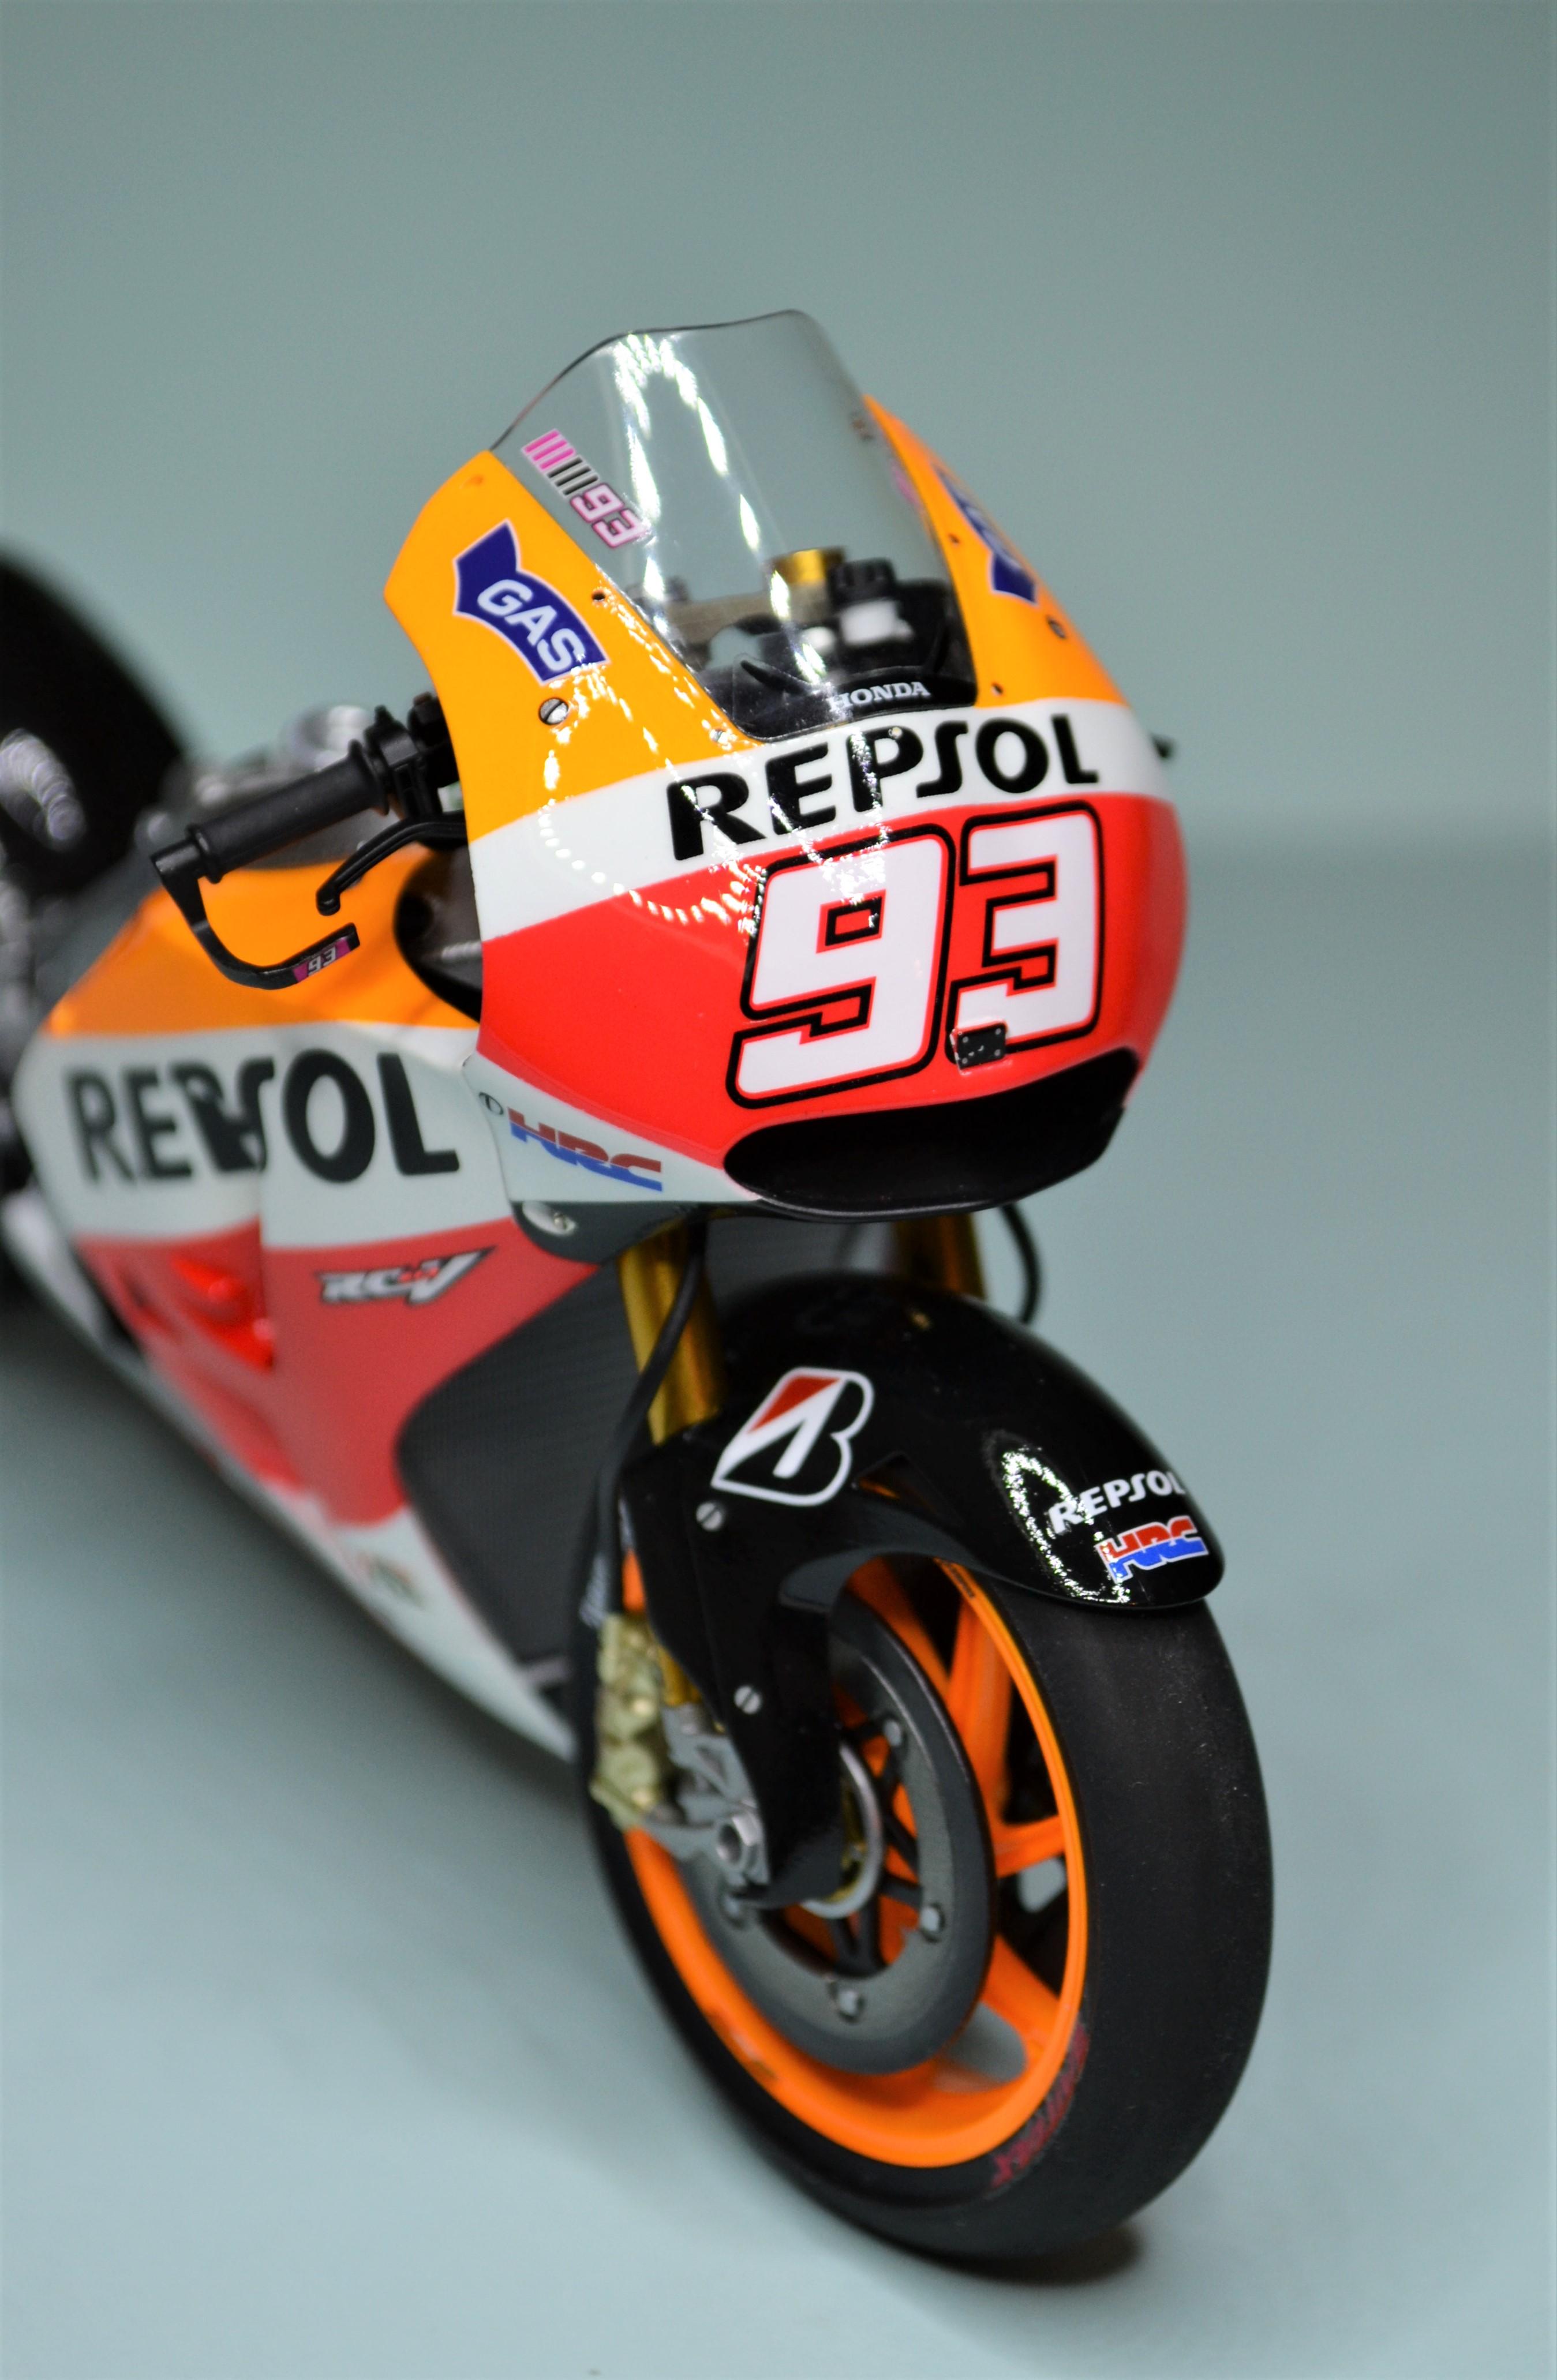 Honda Repsol Marc Marquez 1/12  - Page 2 1707290306229324